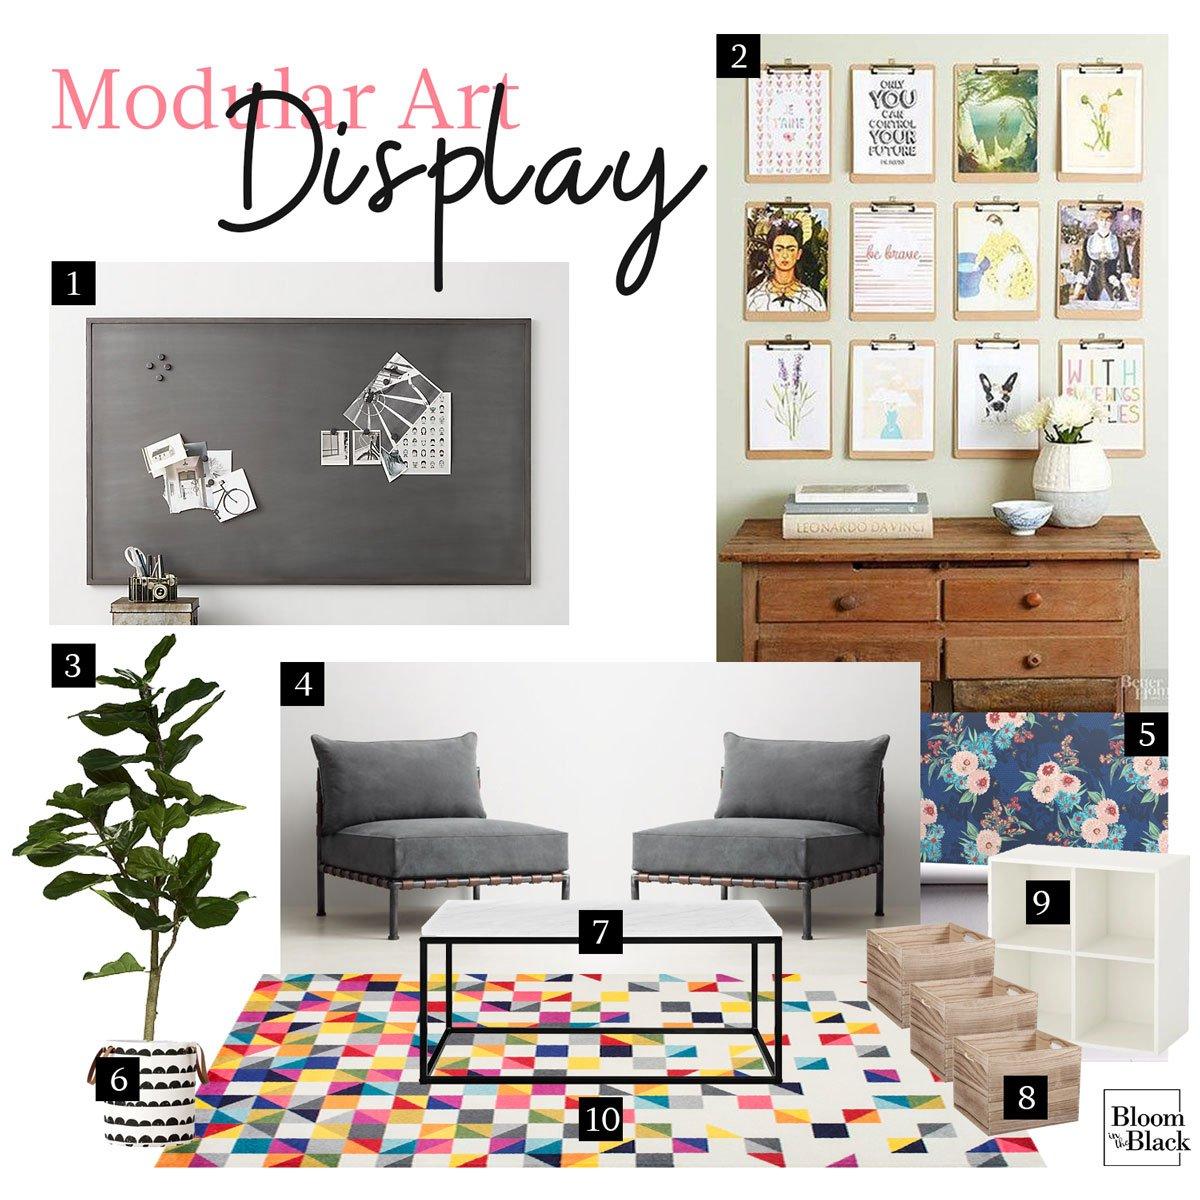 Artsy tween girls room decor with modular art display!